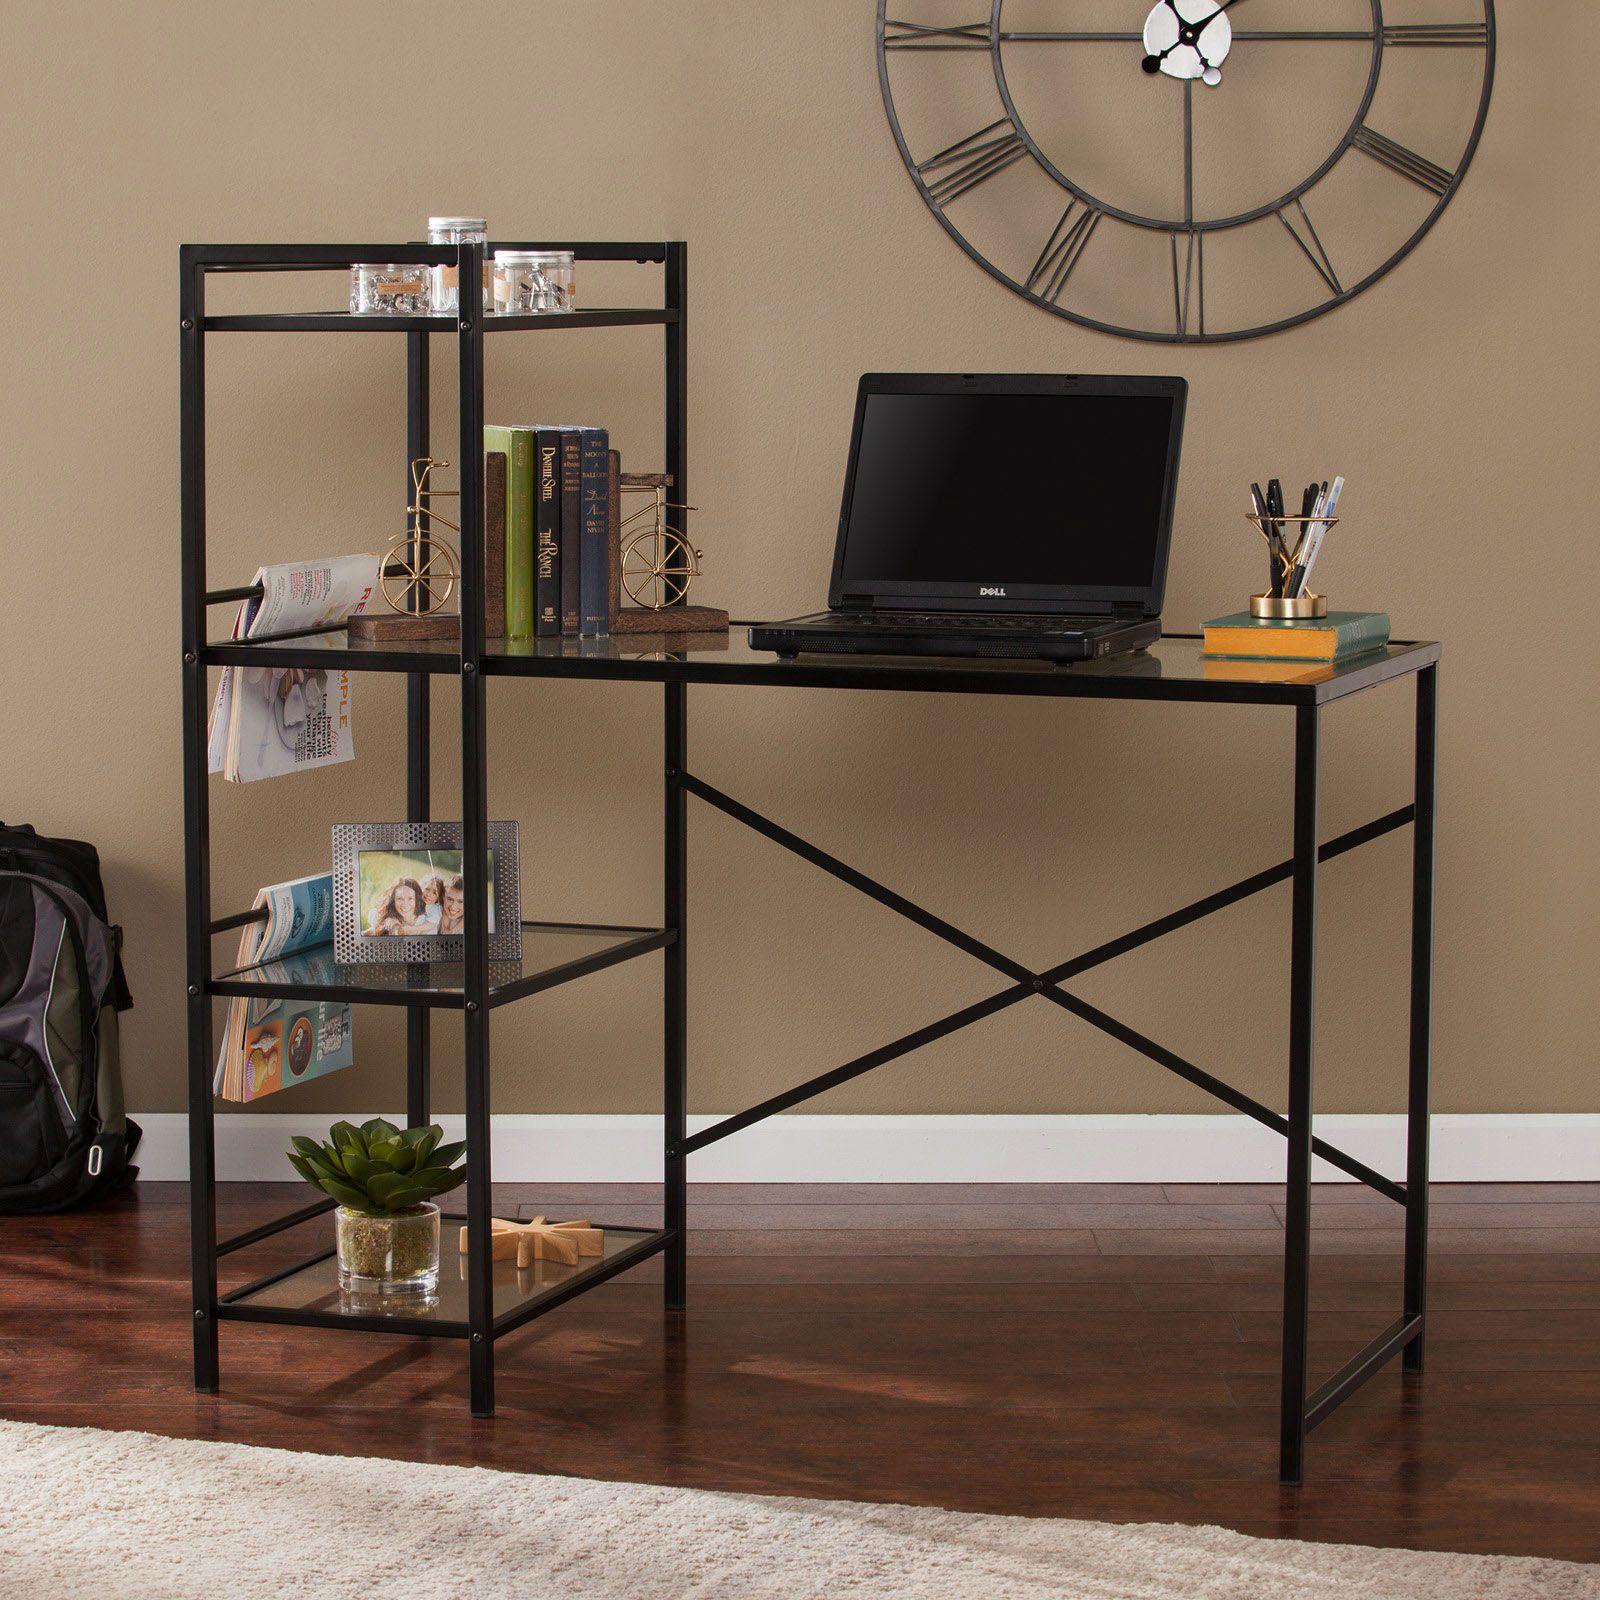 Finest Black Desk Lamp Walmart To Refresh Your Home Home Office Furniture Black Desk Desk Design